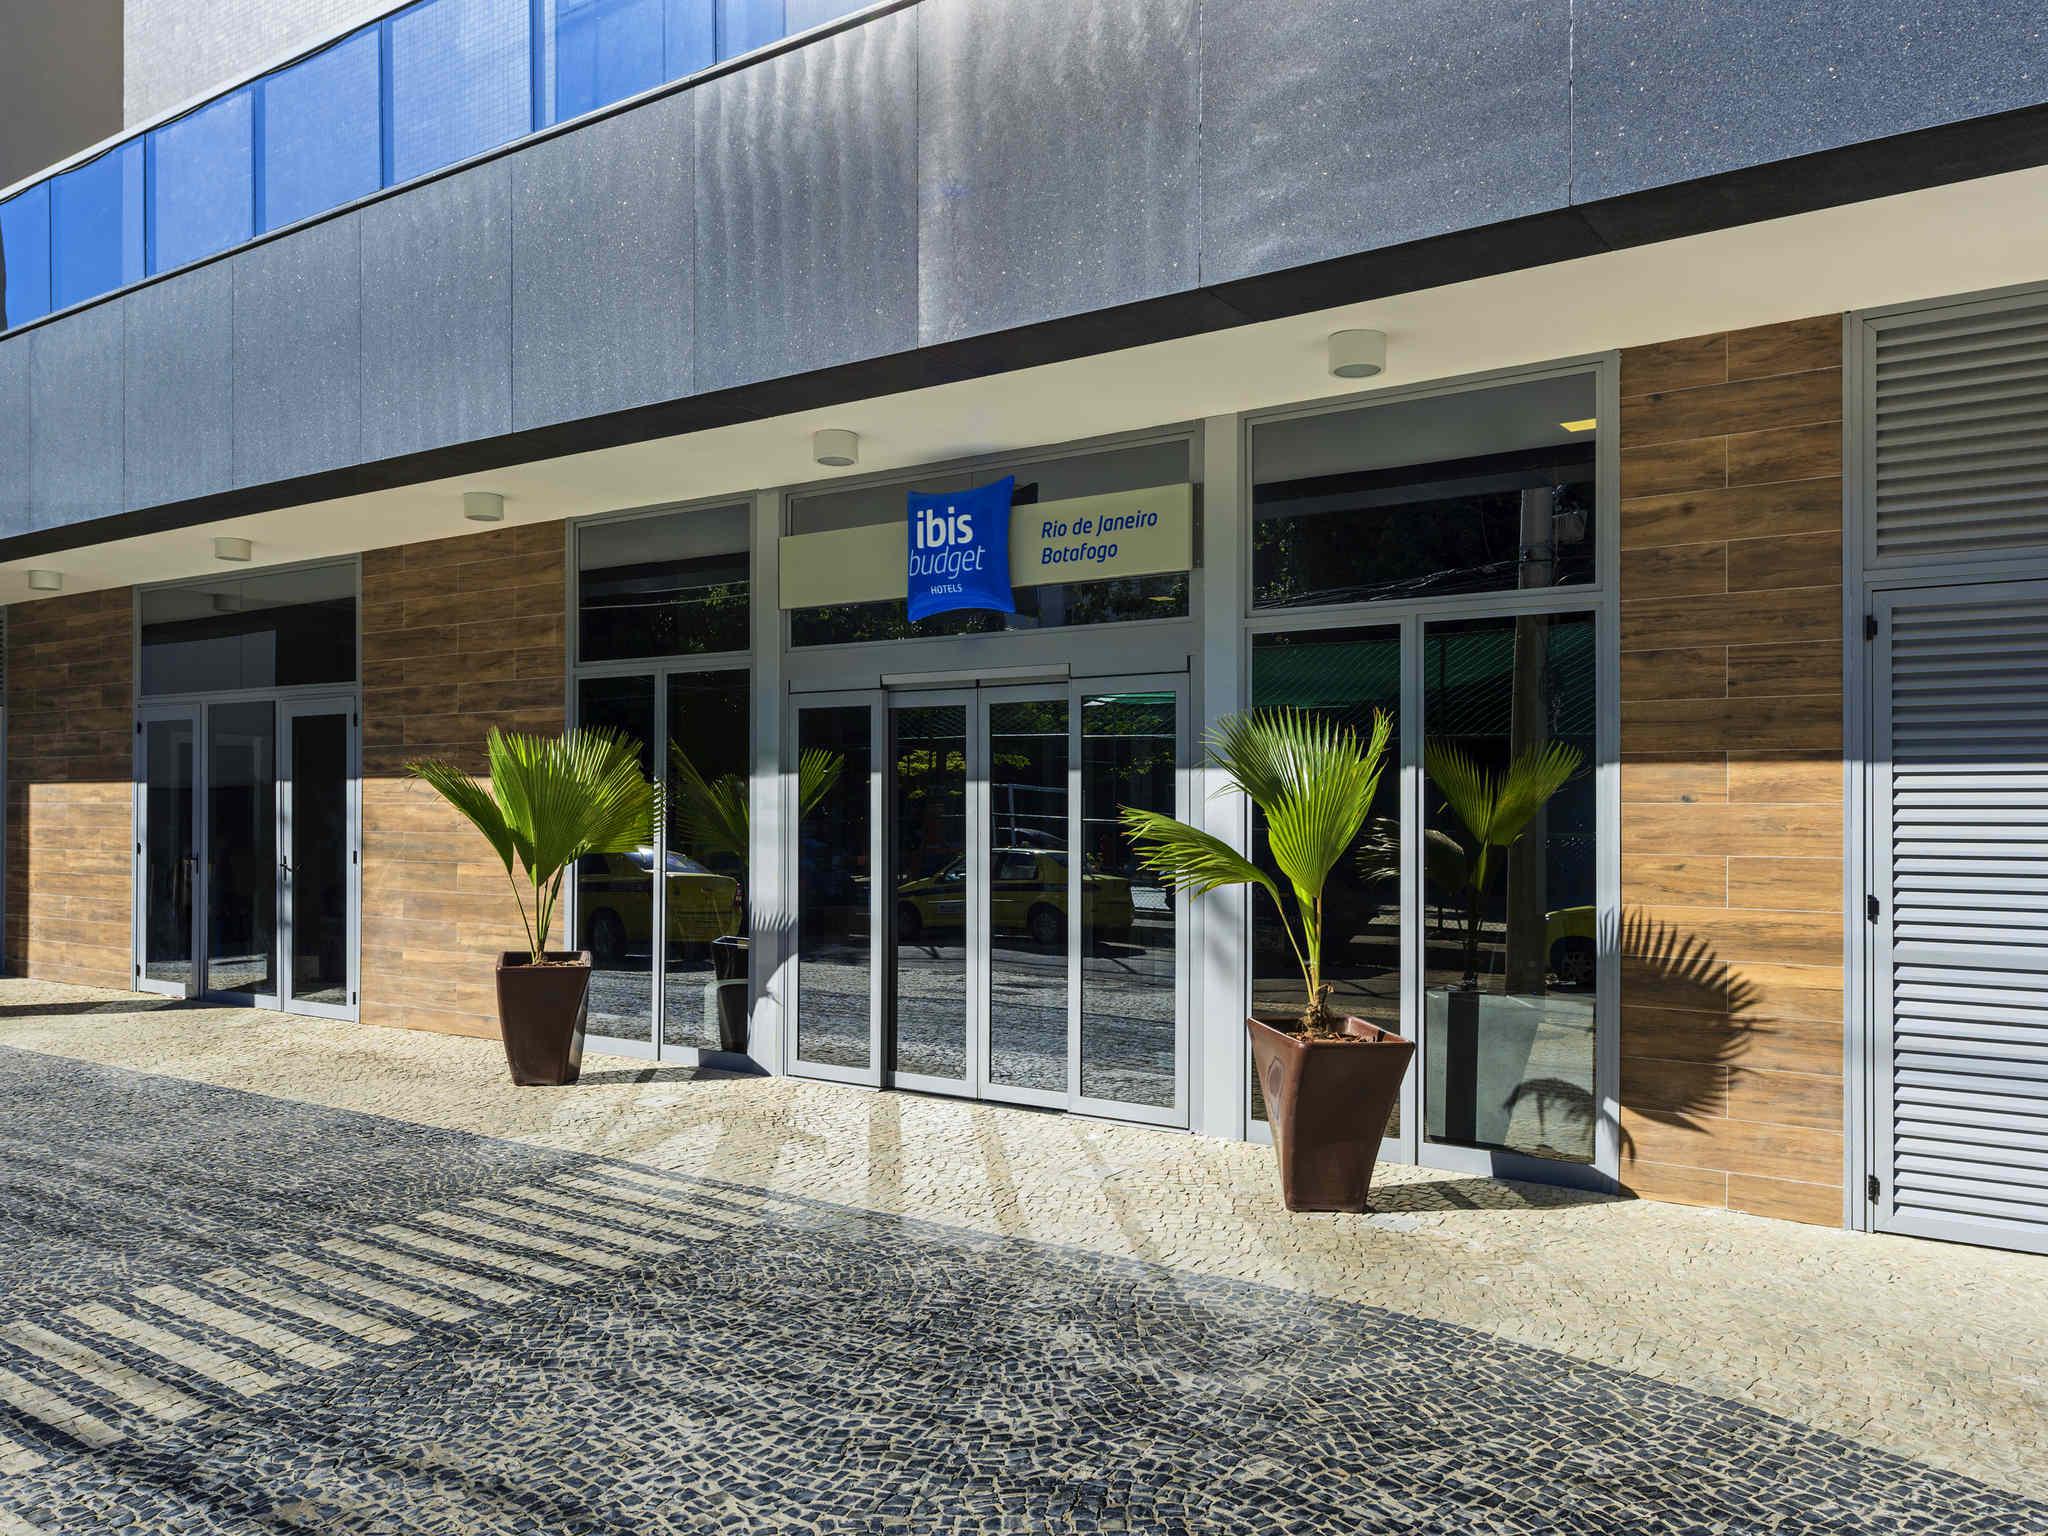 Hôtel - ibis budget RJ Botafogo